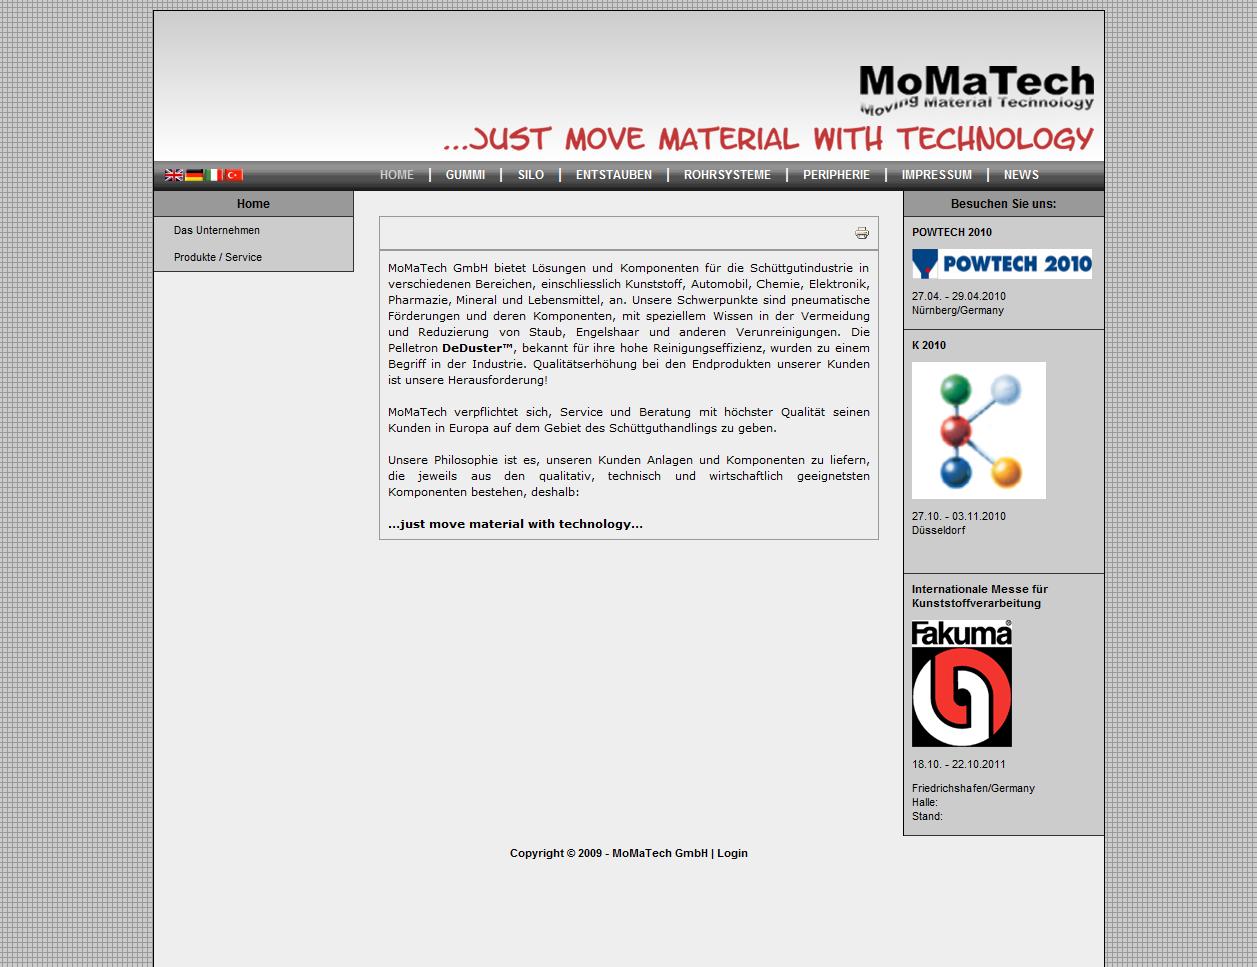 MoMaTech v1